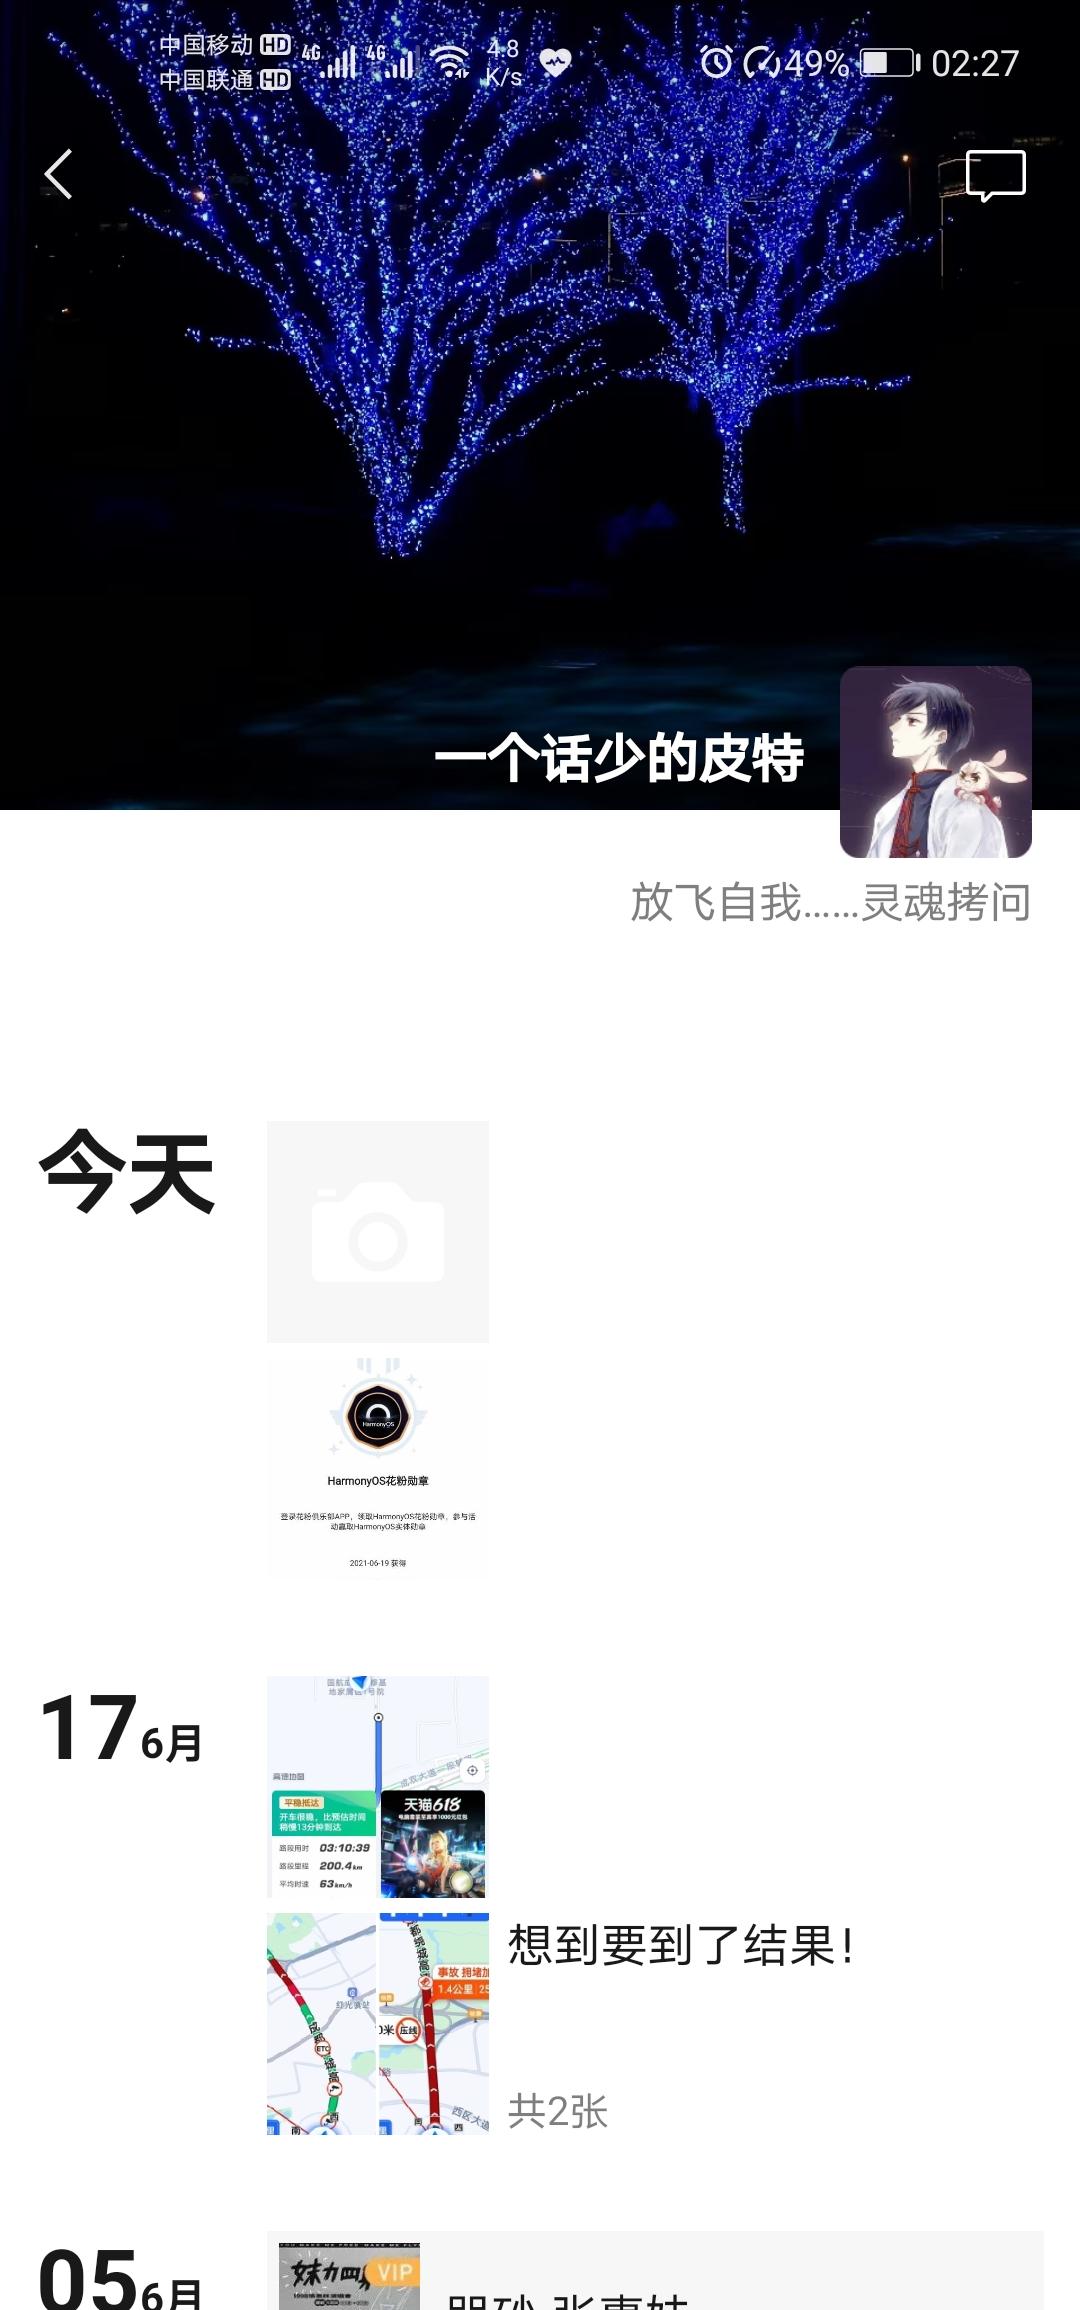 Screenshot_20210619_022712_com.tencent.mm.jpg